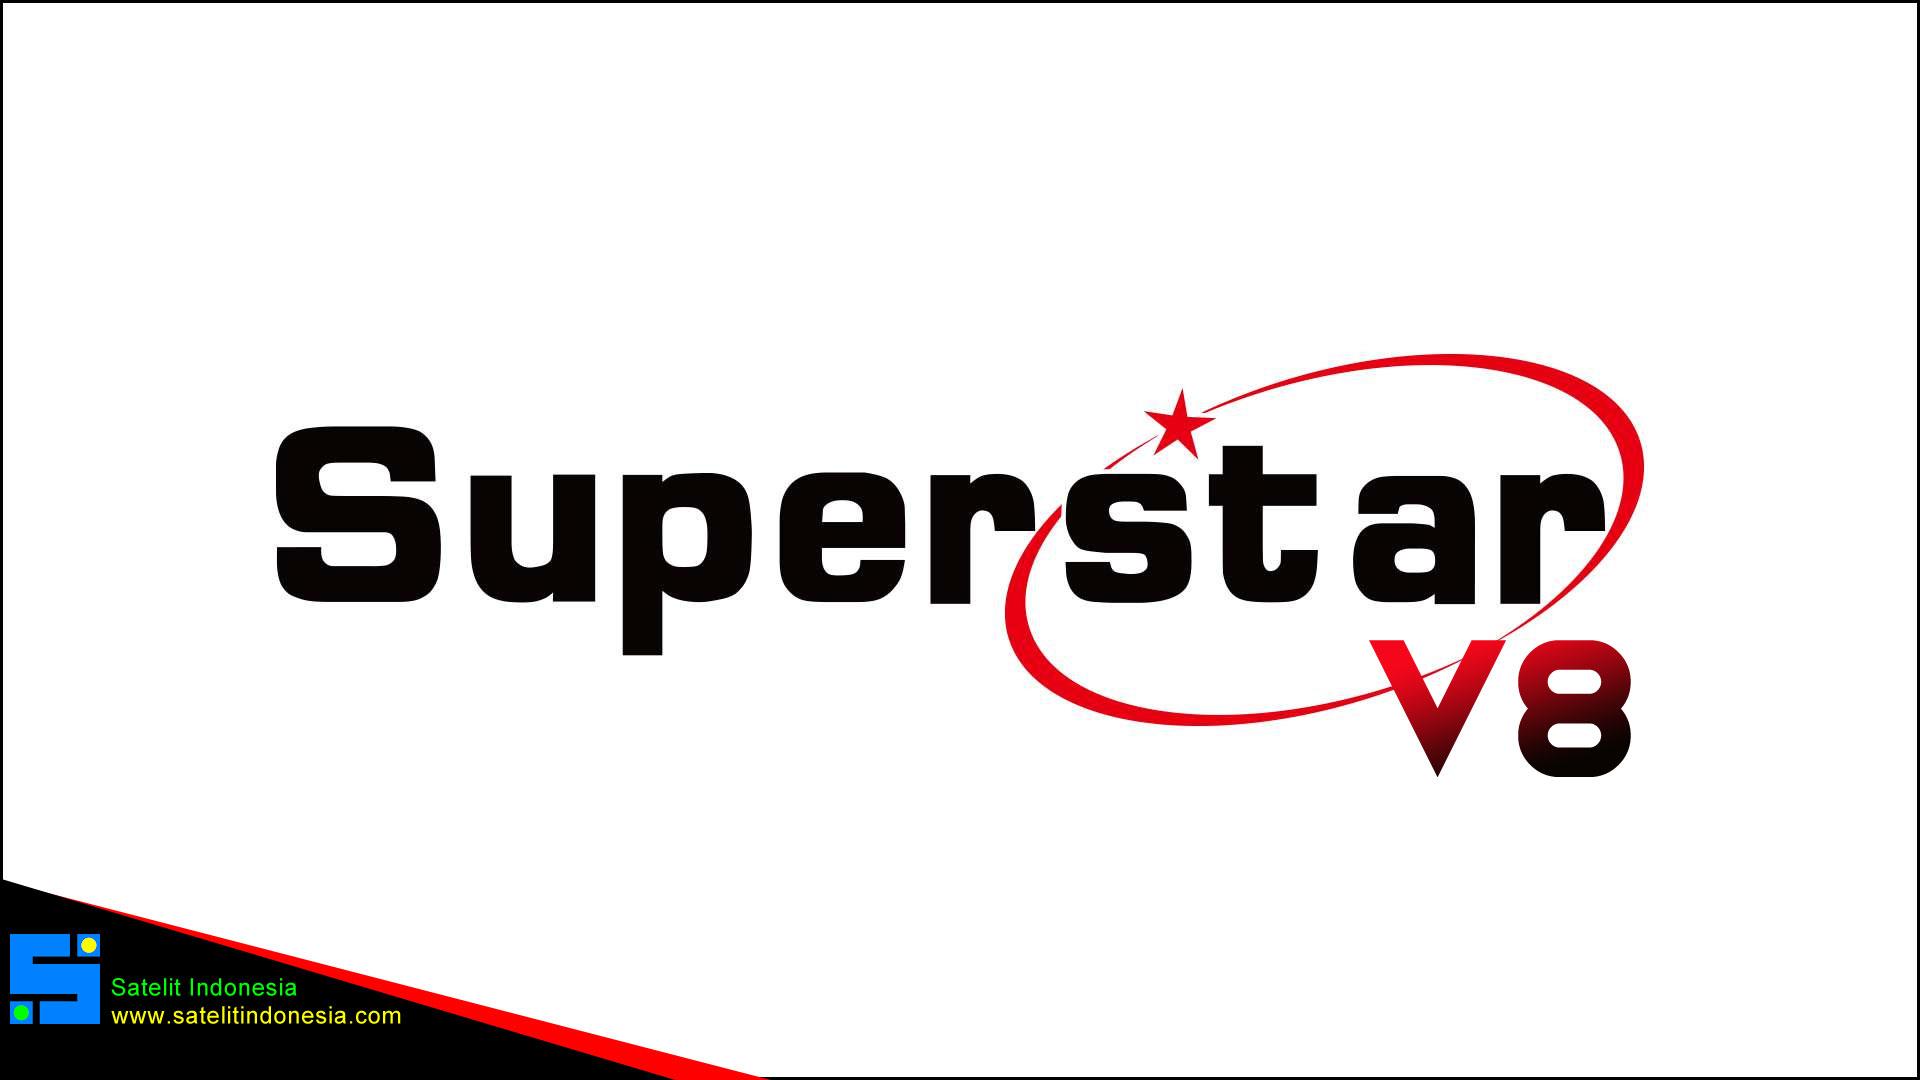 Download Software Superstar V8 Receiver New Update Firmware